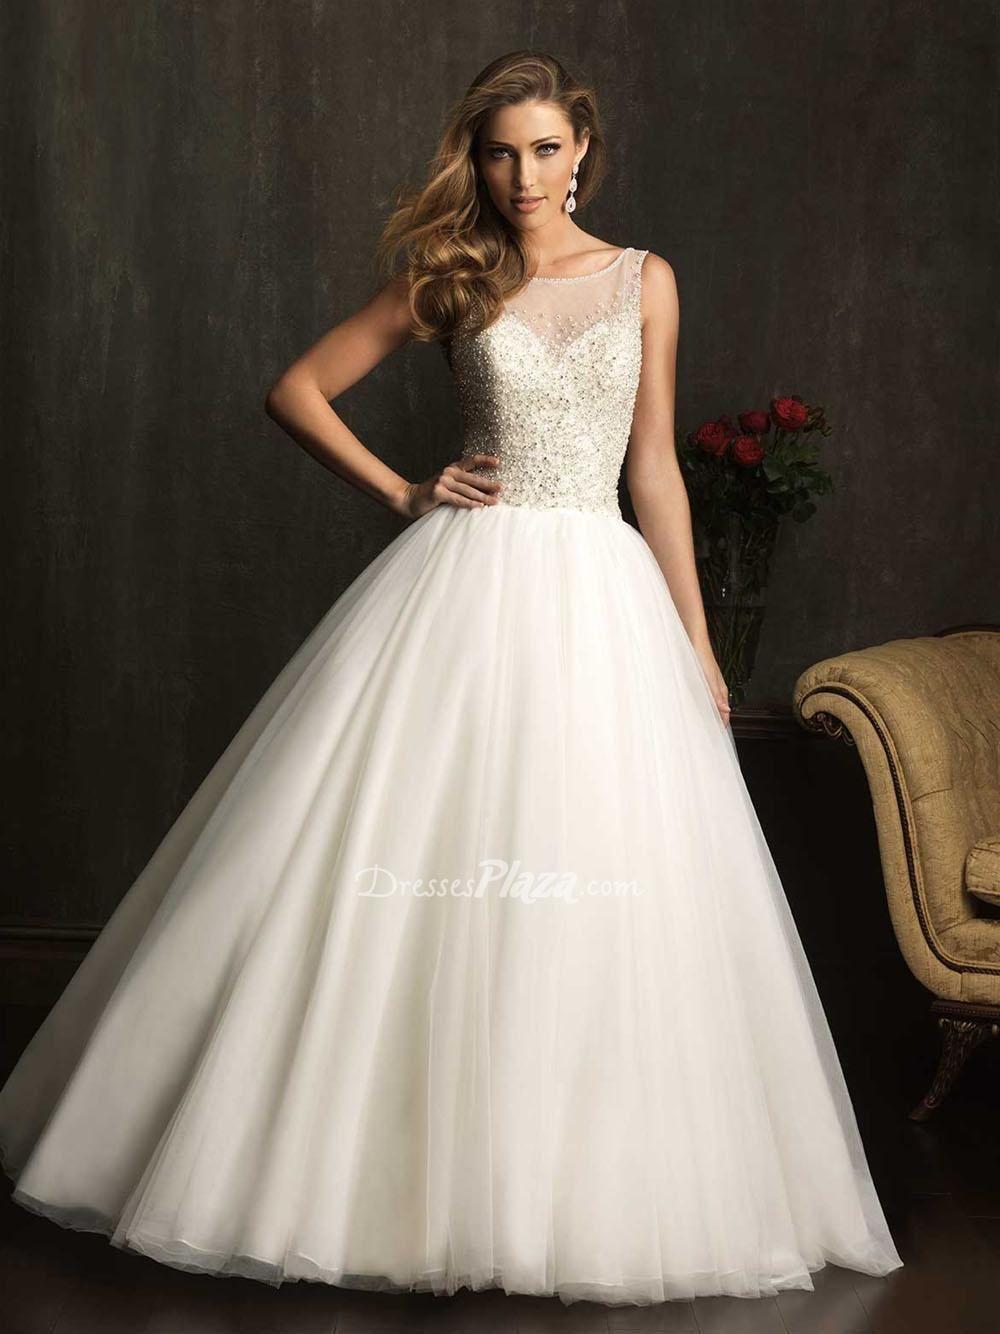 Elaborate Ball Gown Sheer Boat Neck Beaded Bodice Sleeveless Wedding Dress 81700 0ff 338